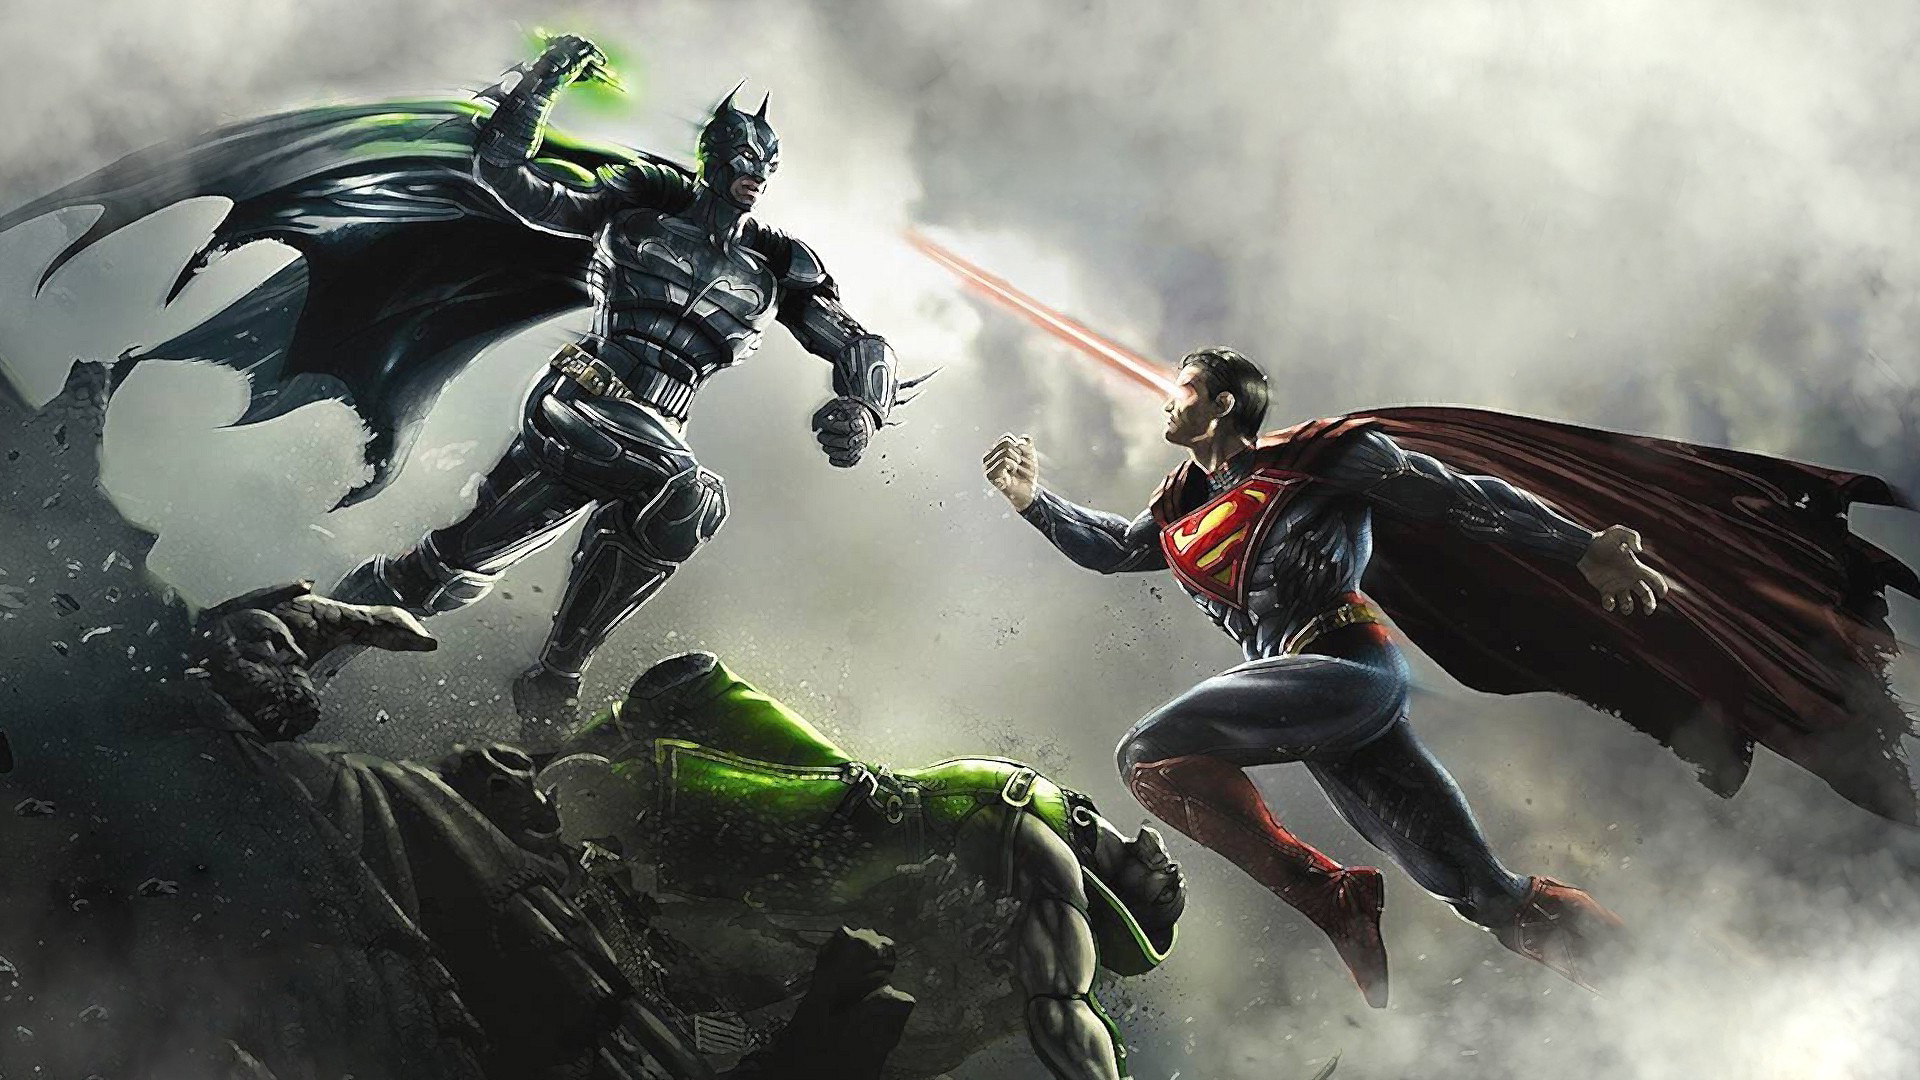 HDoboi.Kiev.ua - Бэтмен против Супермена, обои на айфон бэтмен, dc wallpapers, batman